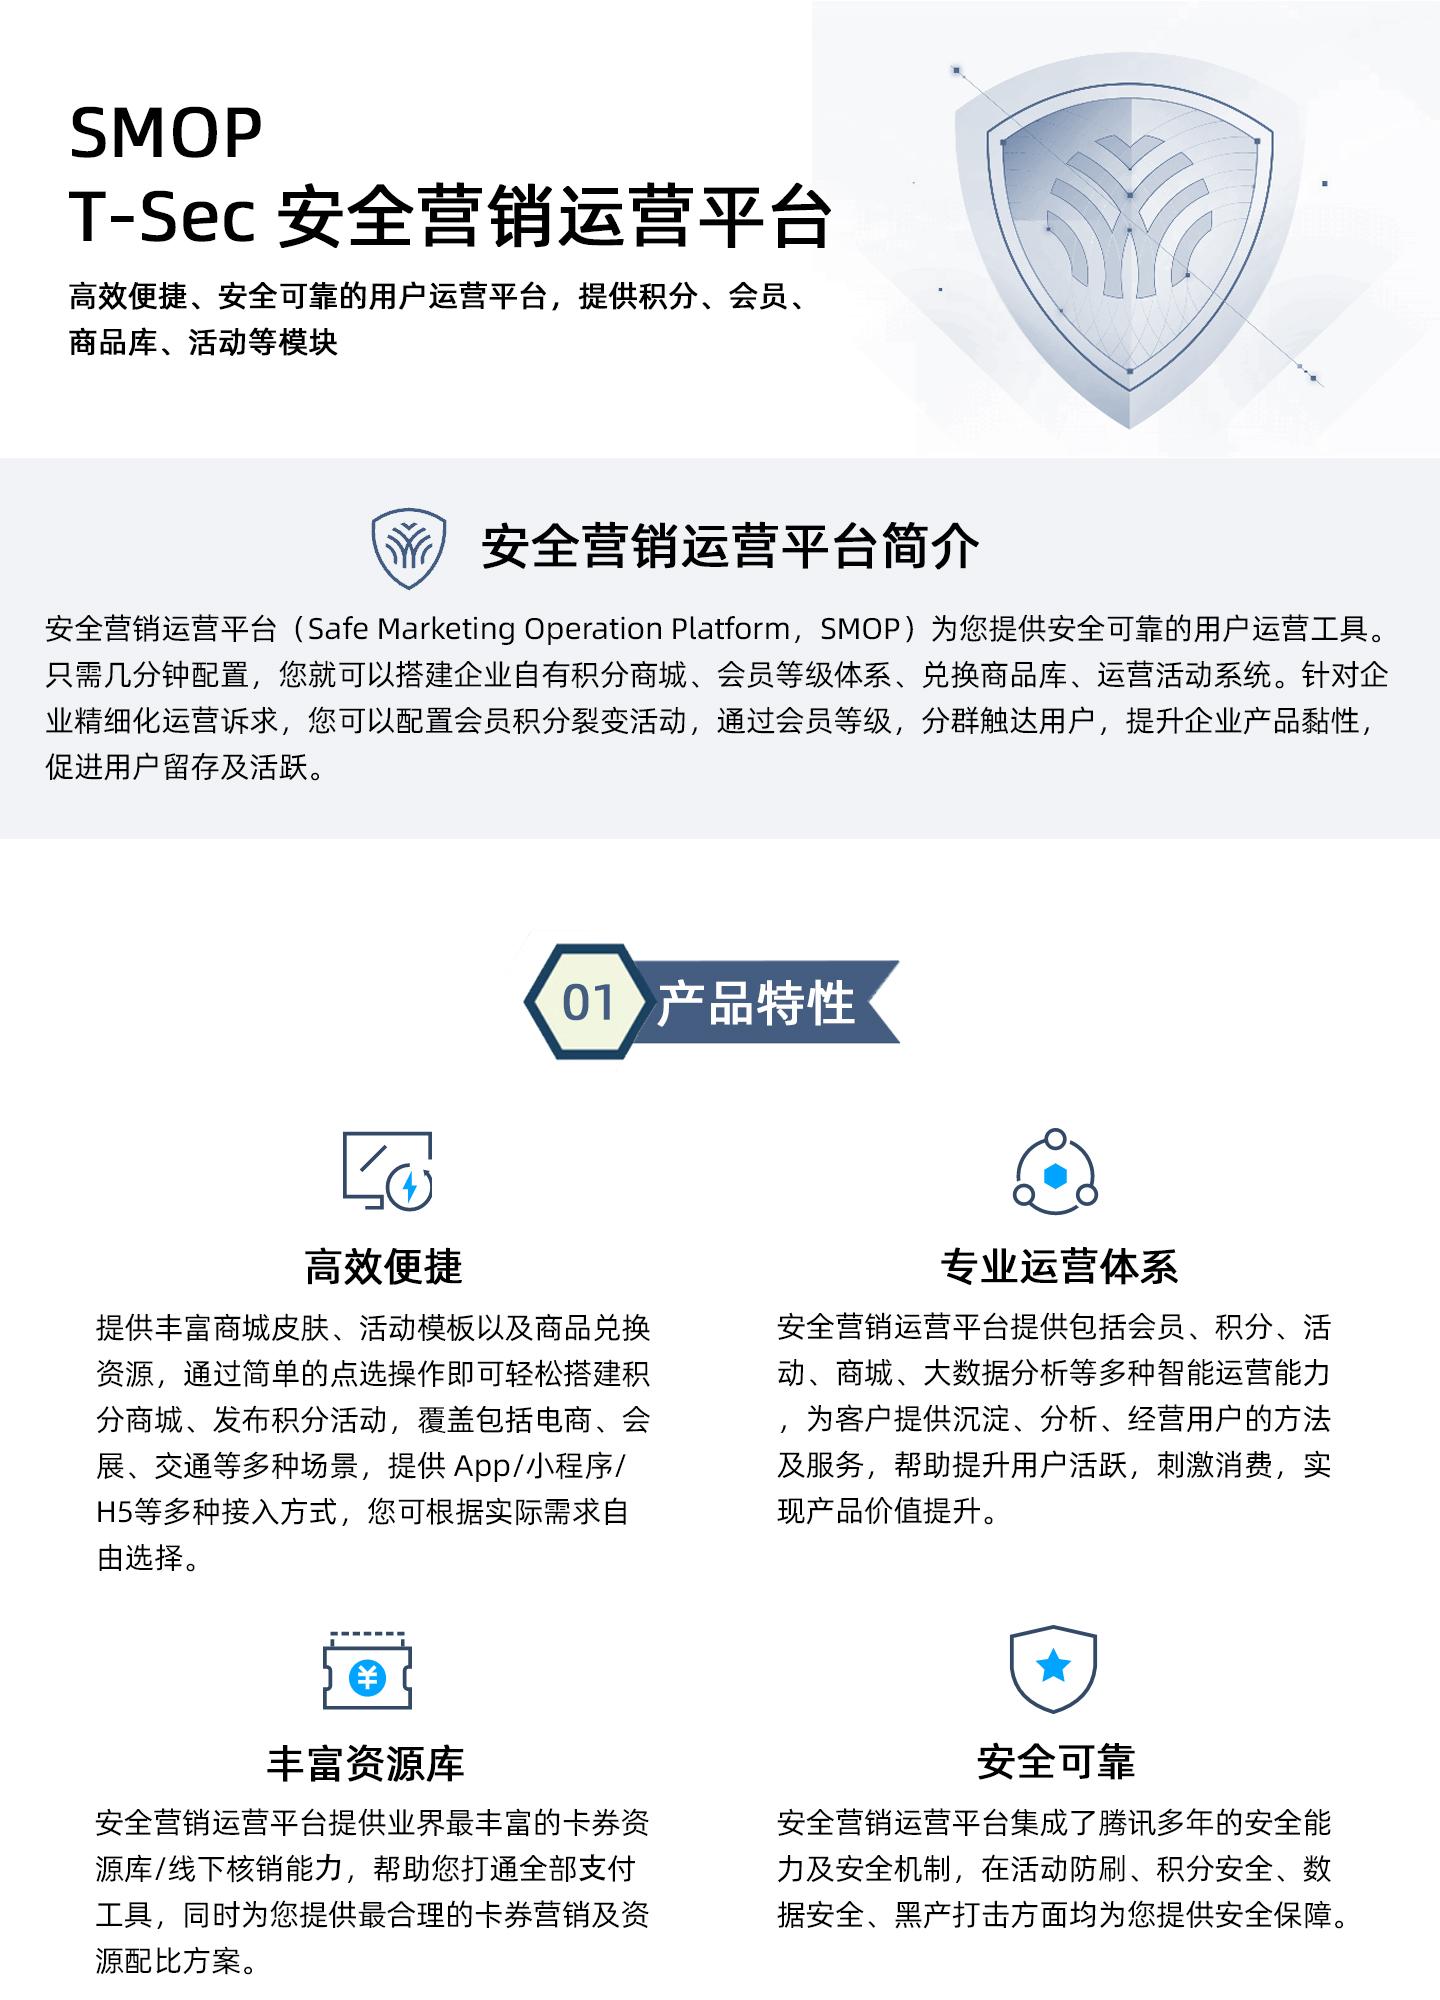 T-Sec-安全营销运营平台-SMOP-1440_01.jpg